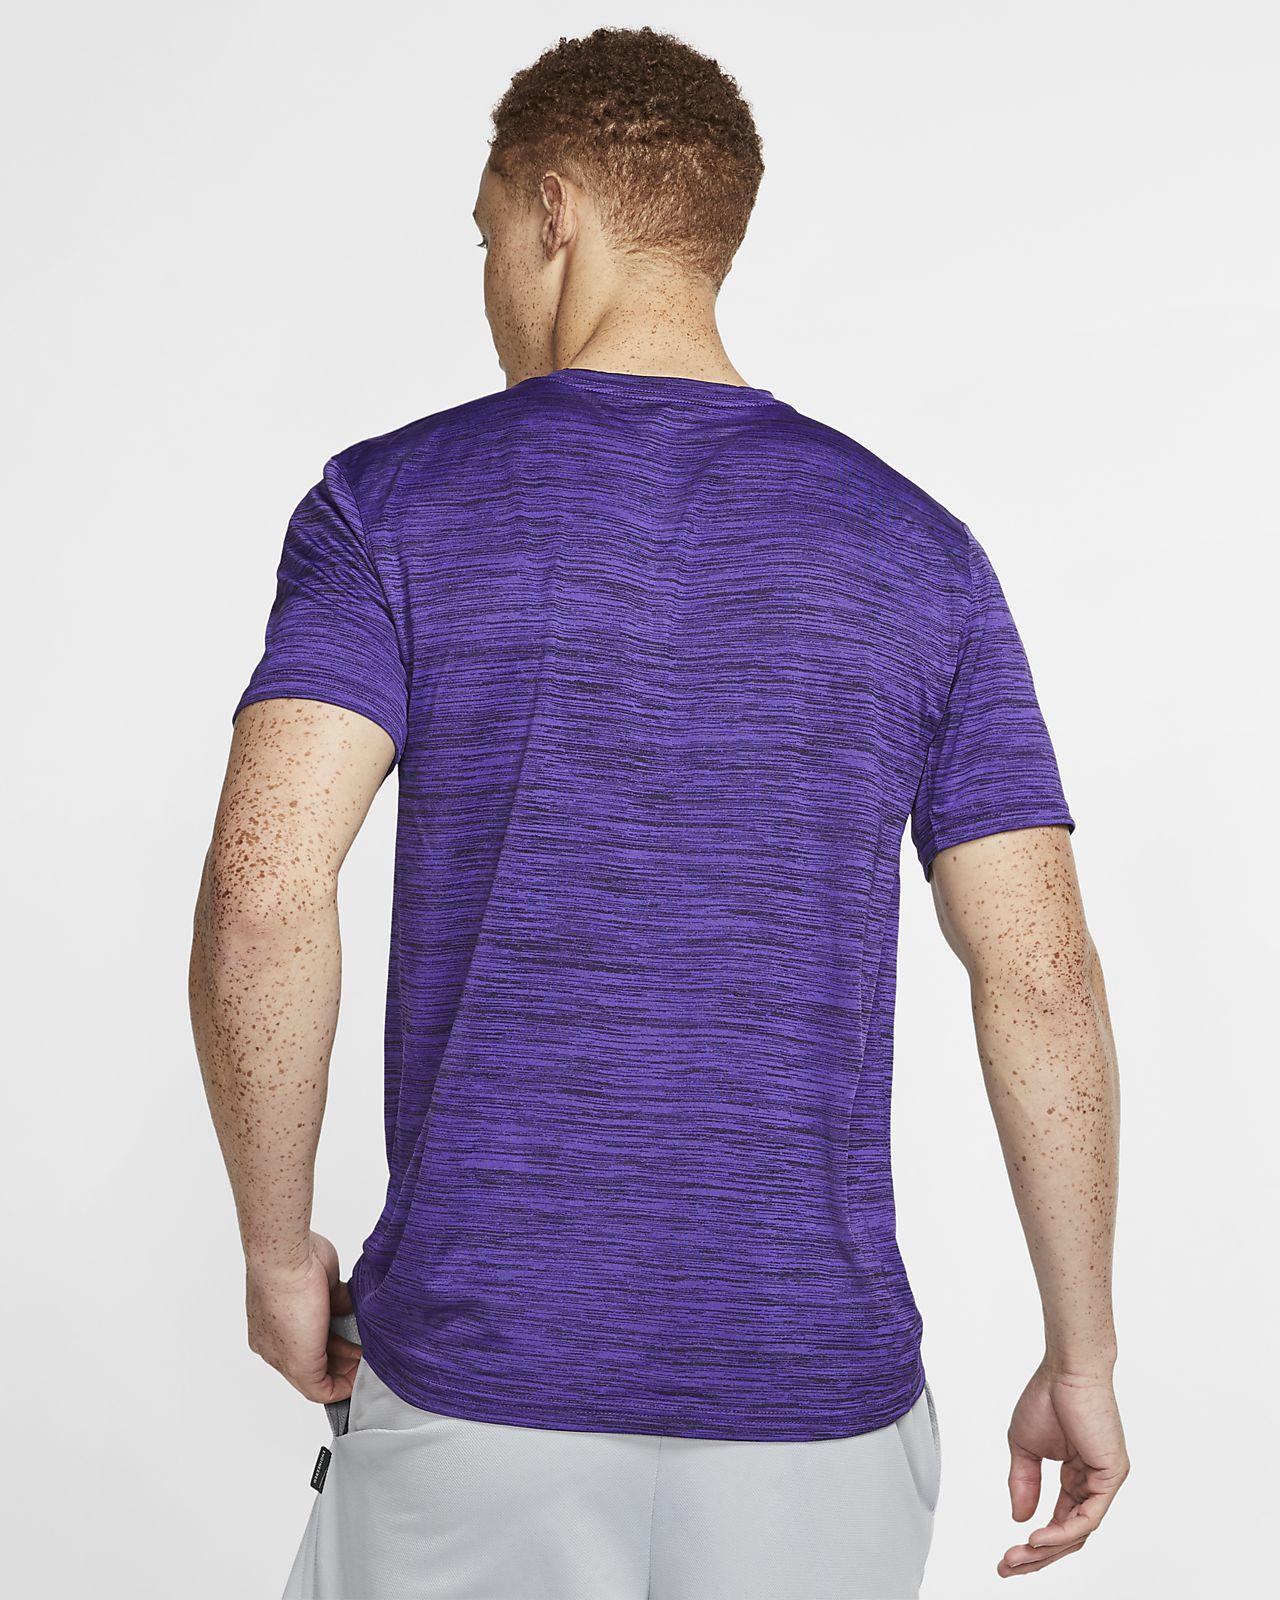 save off 7657c d6ac7 Nike College Dri-FIT Legend Velocity (LSU) Men's T-Shirt